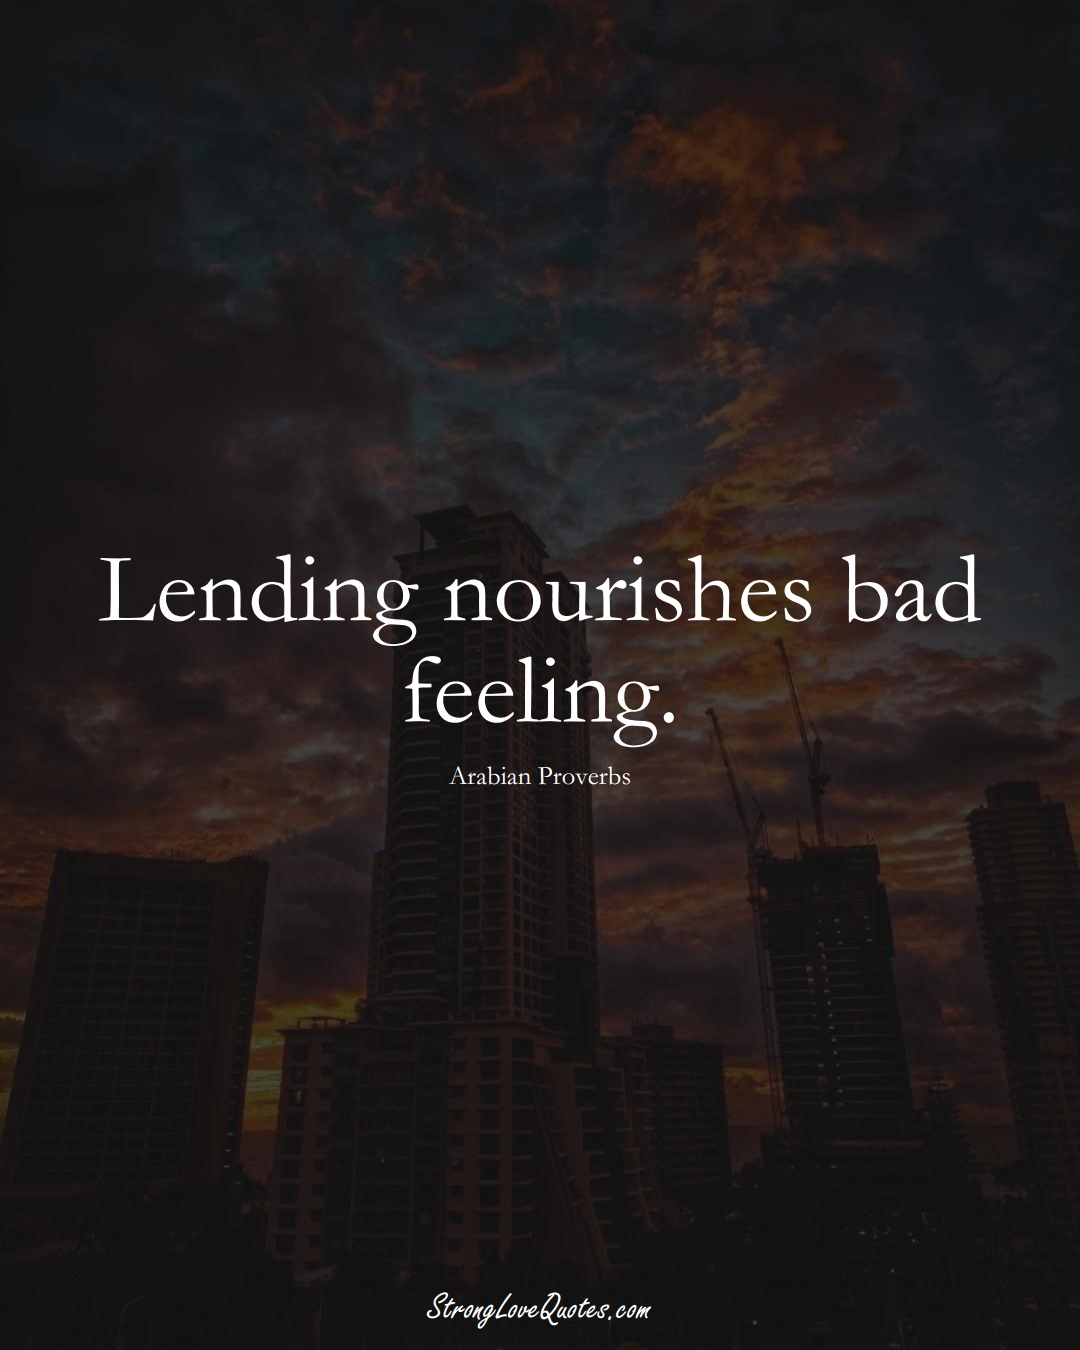 Lending nourishes bad feeling. (Arabian Sayings);  #aVarietyofCulturesSayings